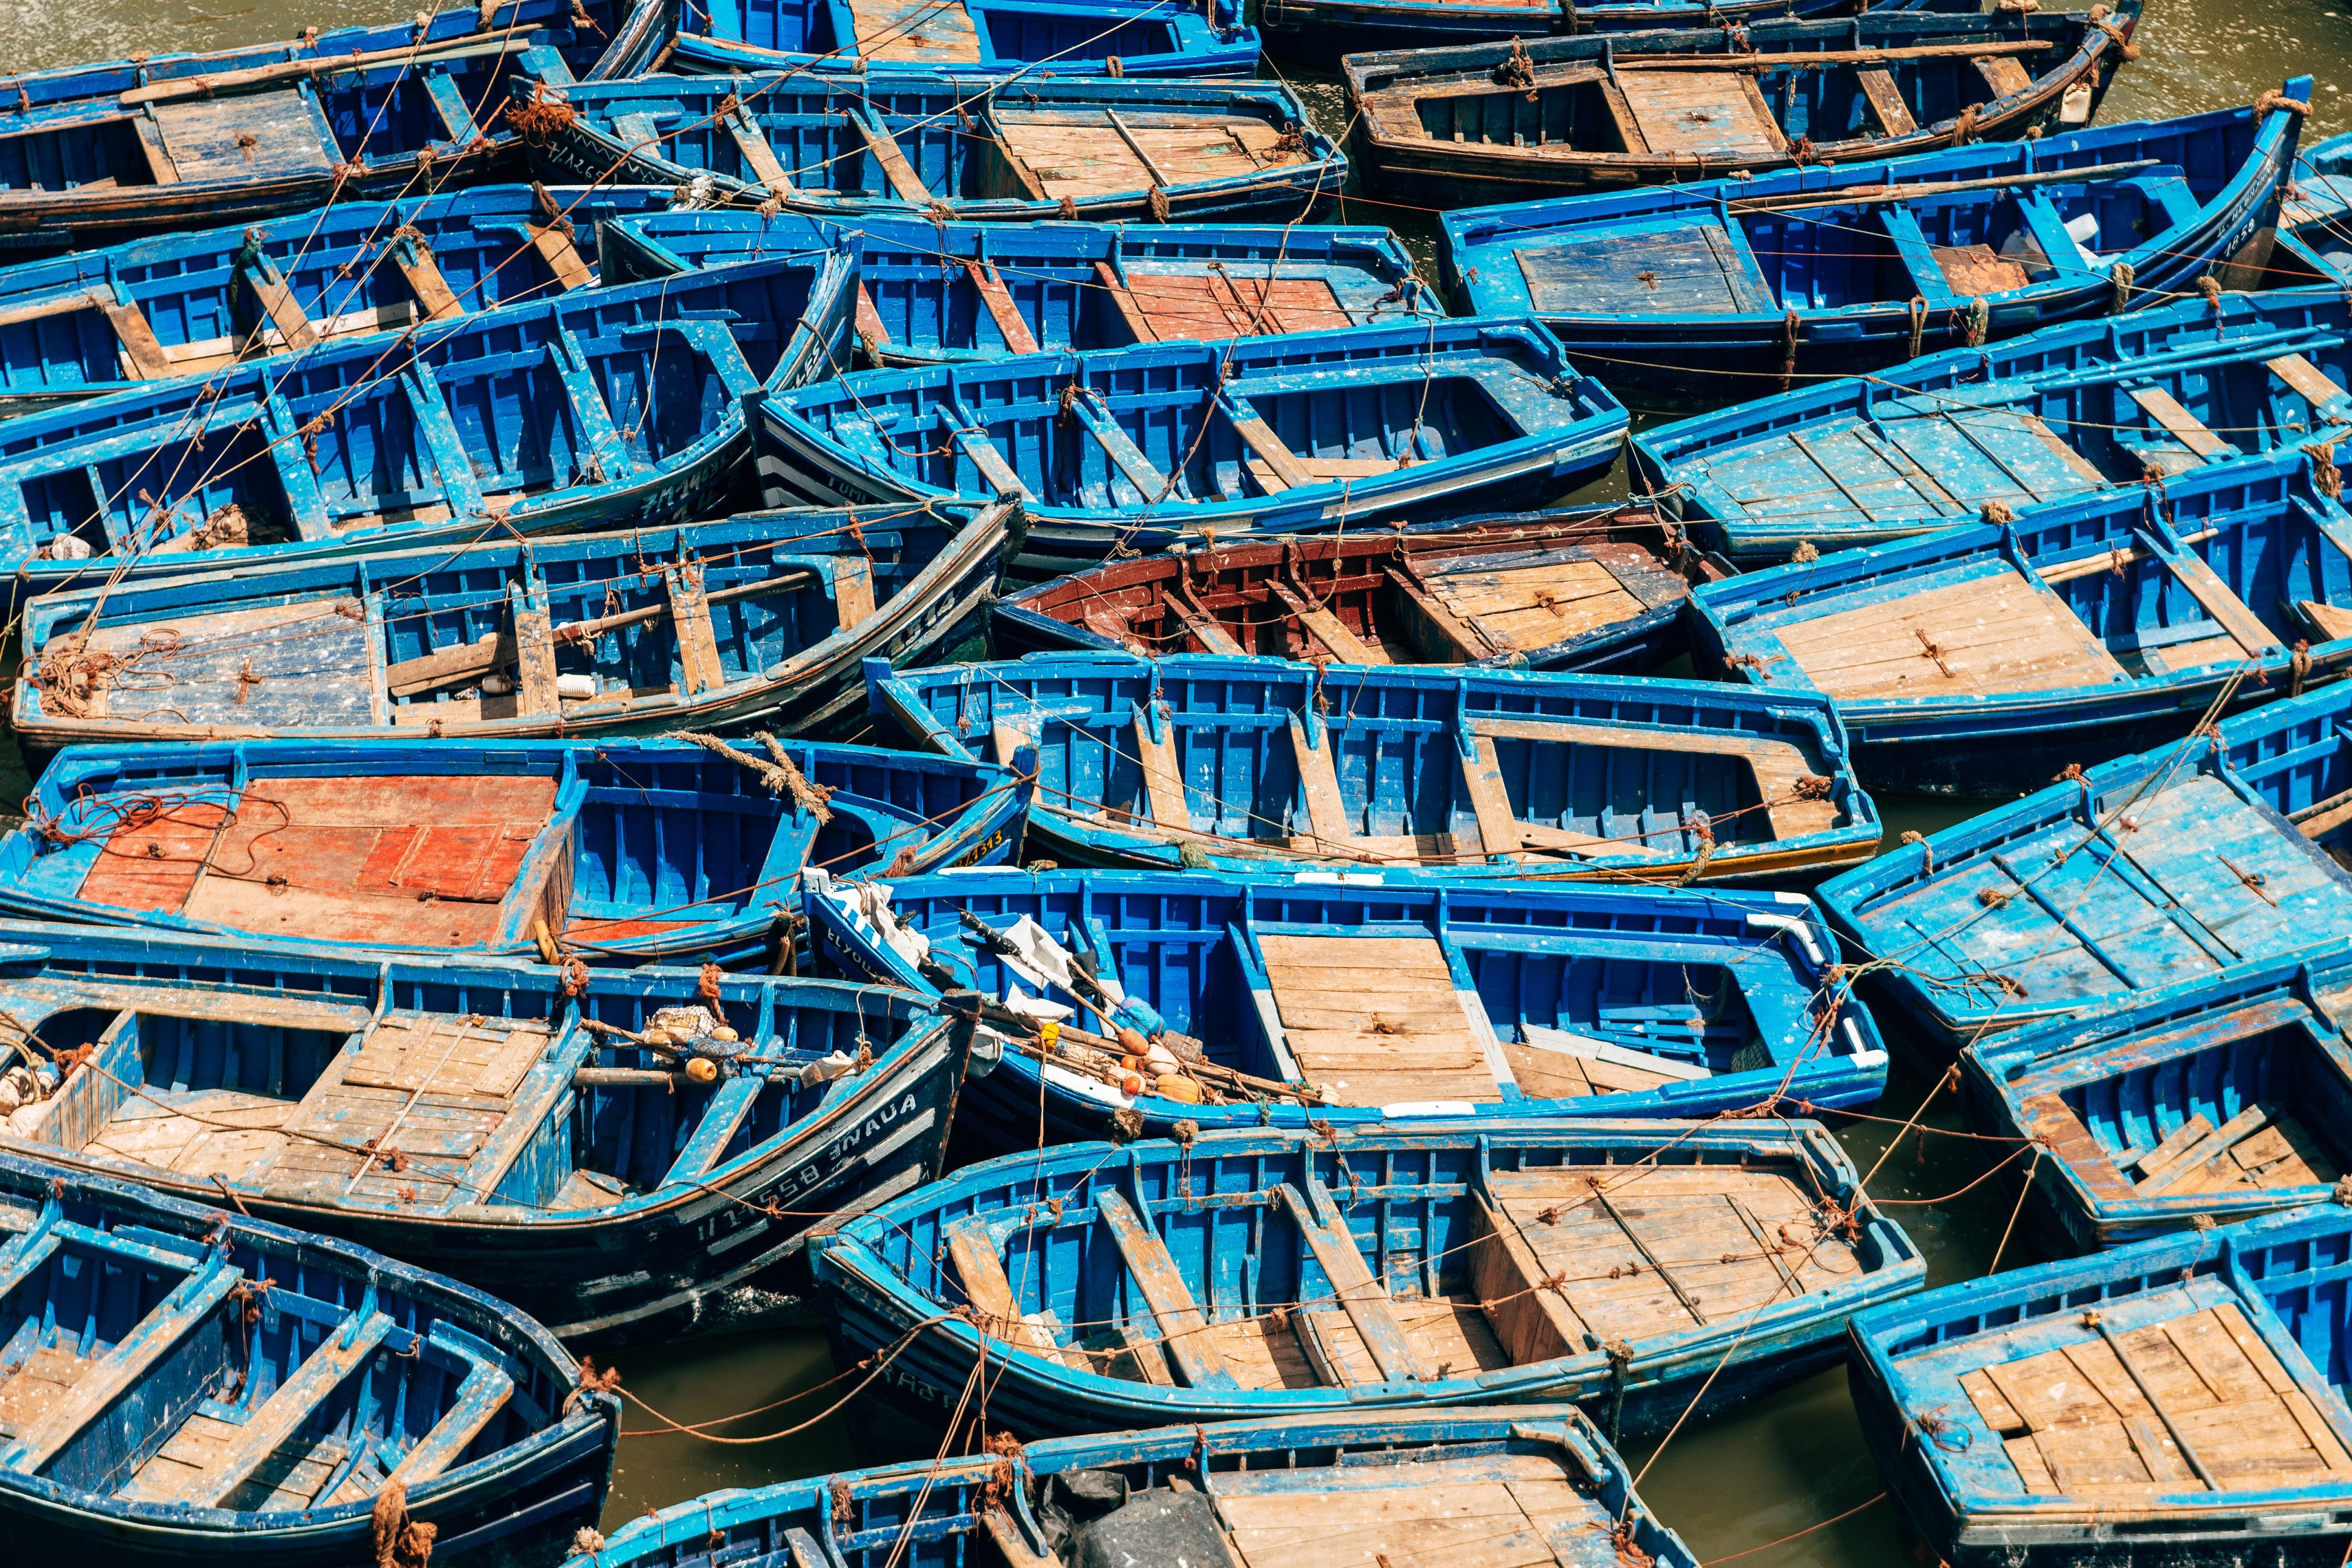 Morocco Boat Fishing Boat Blue Old Sea Shore Town Fleet Harbor Transport 4500x3000